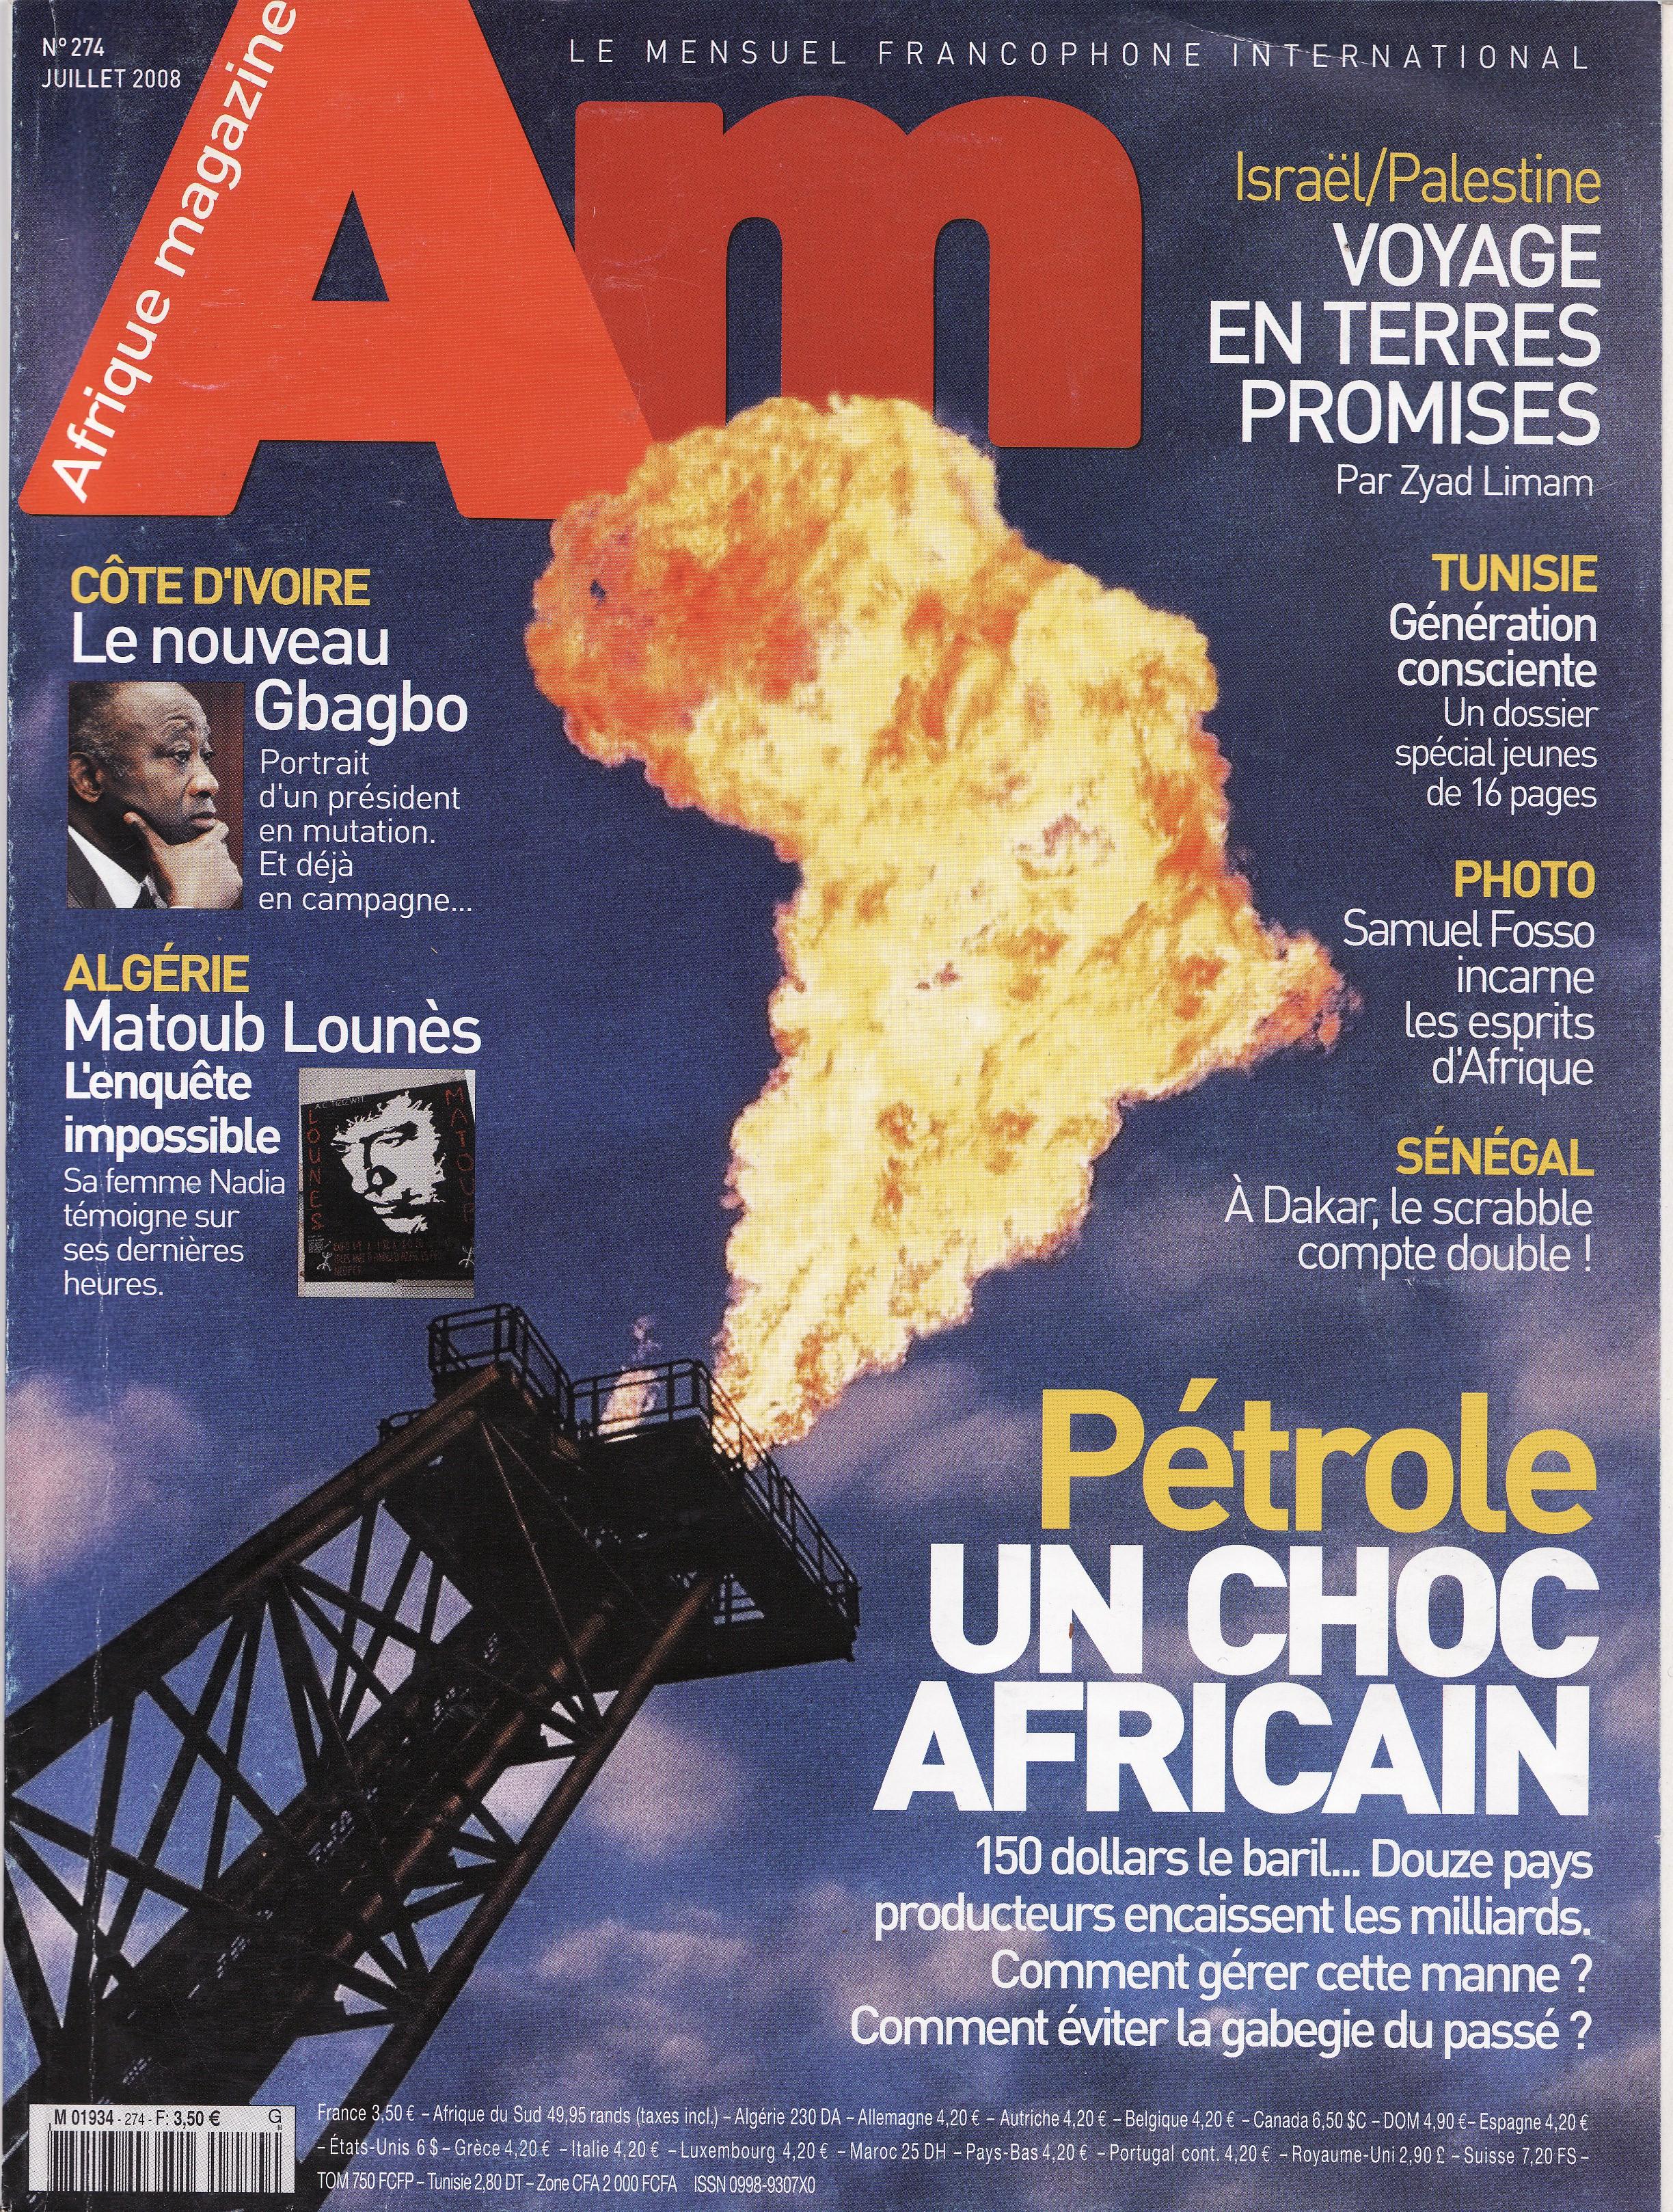 AFRIQUE MAGAZINE JLT 2008